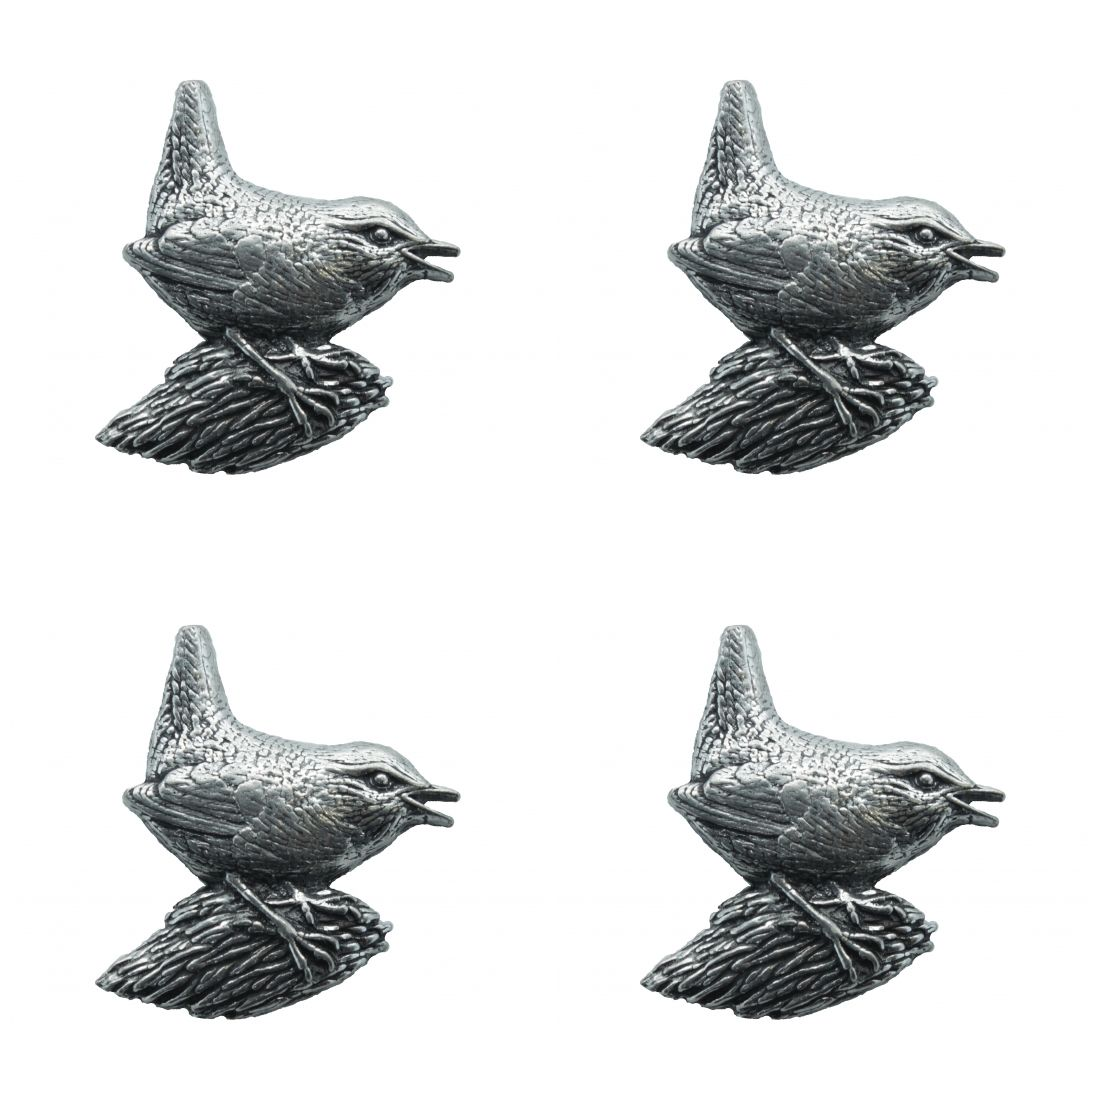 4 x Pin Anstecker Badge Winterkönig, 3,3x3,6cm